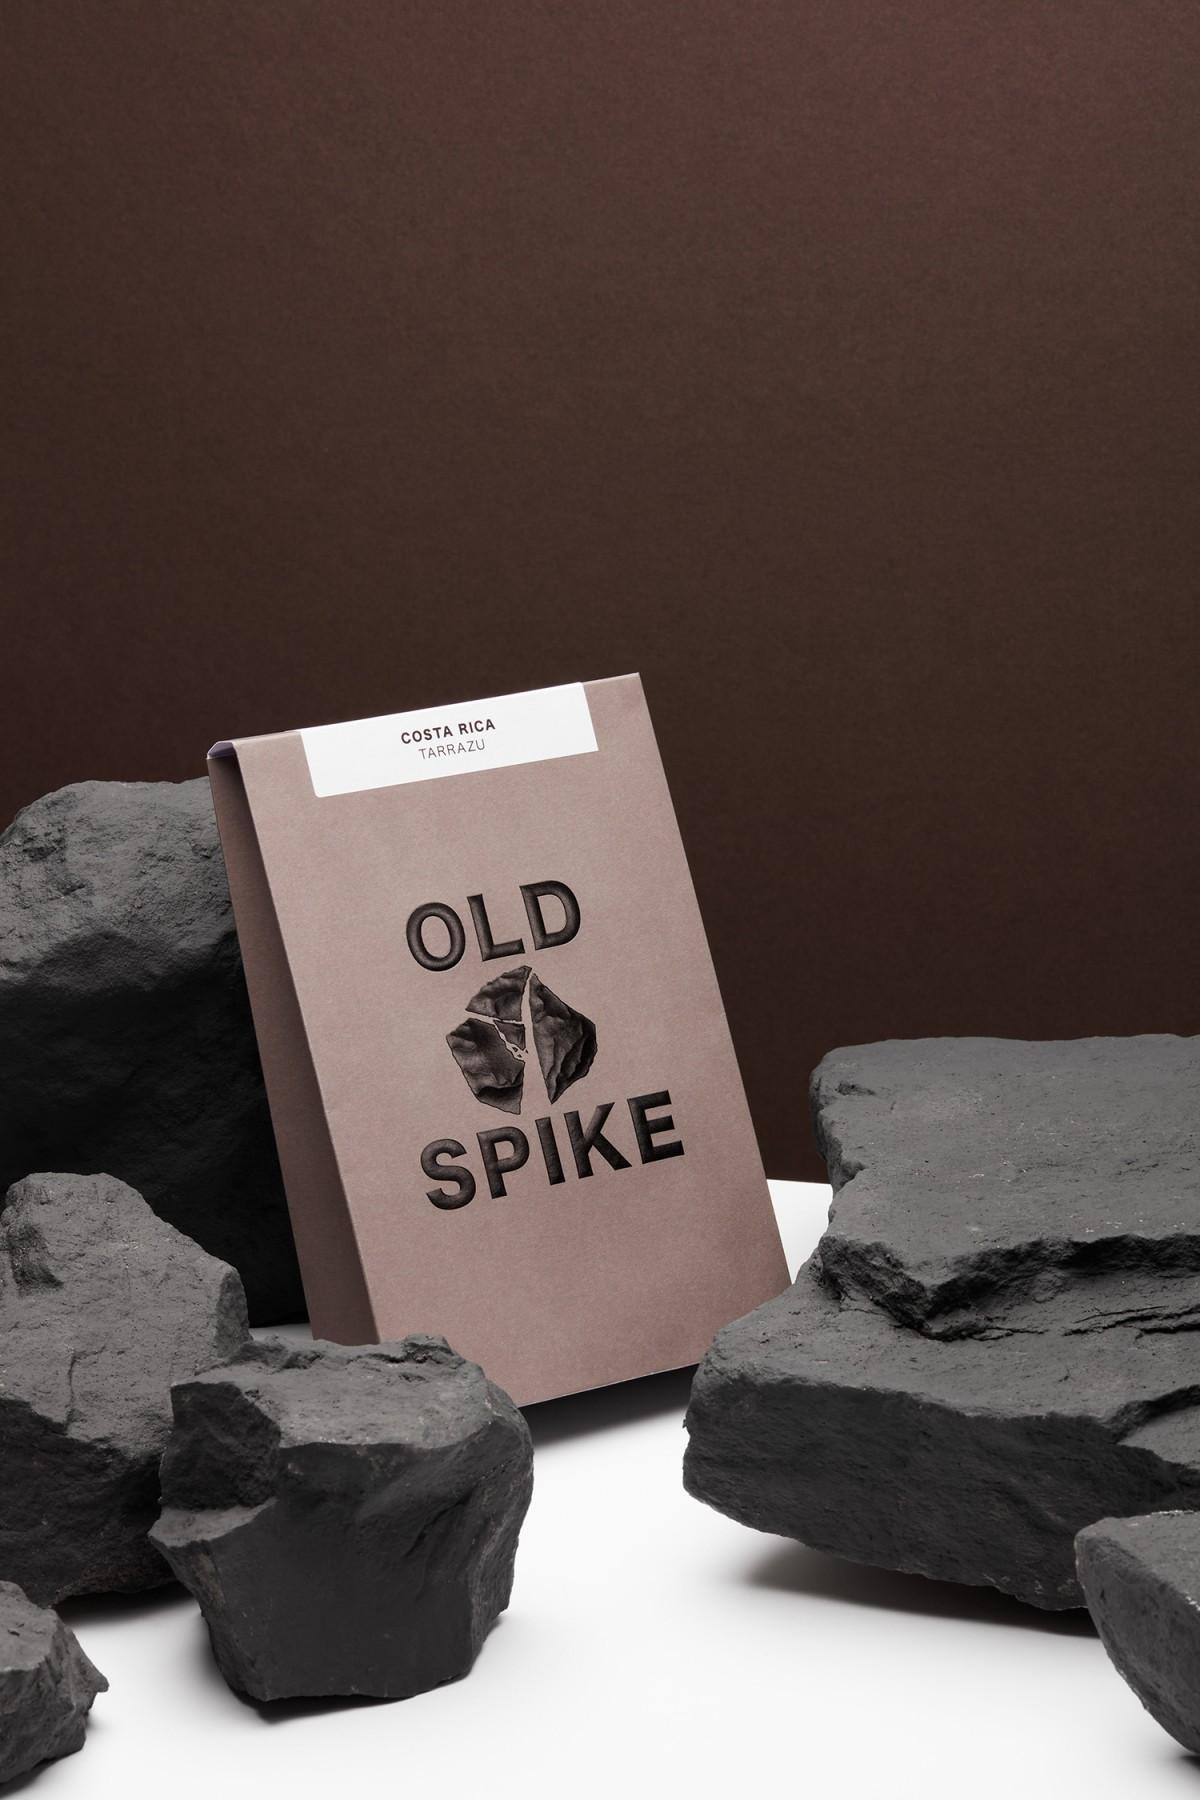 OldSpike咖啡产品包装盒设计